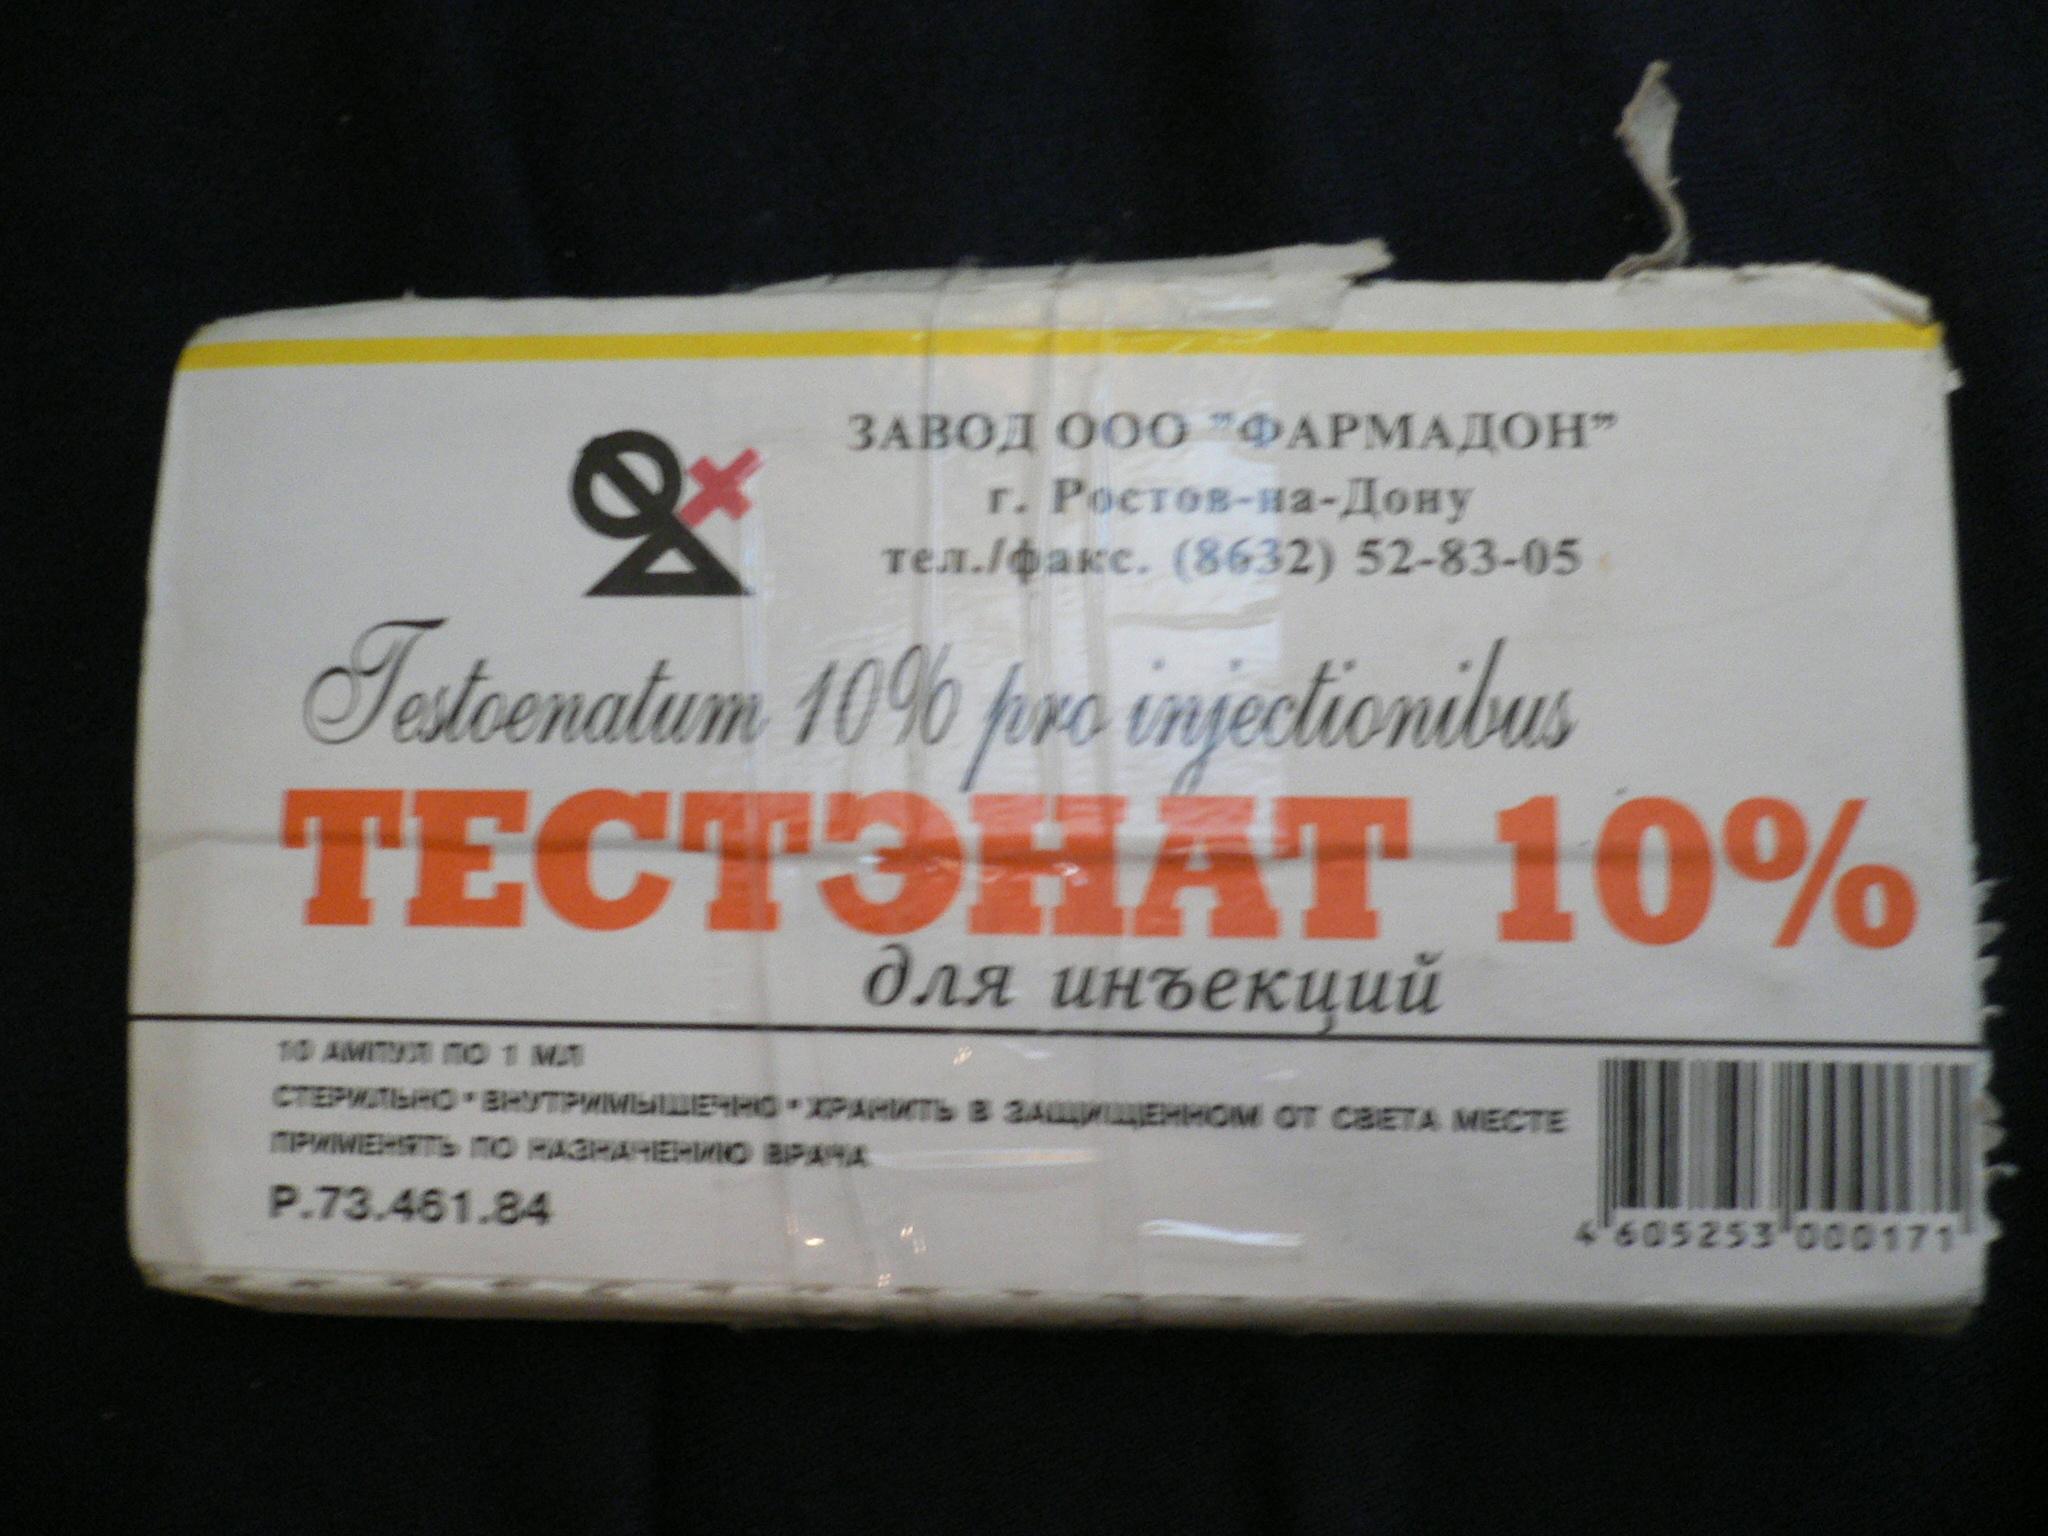 Testo-prop-1 100 mg ubiquinol